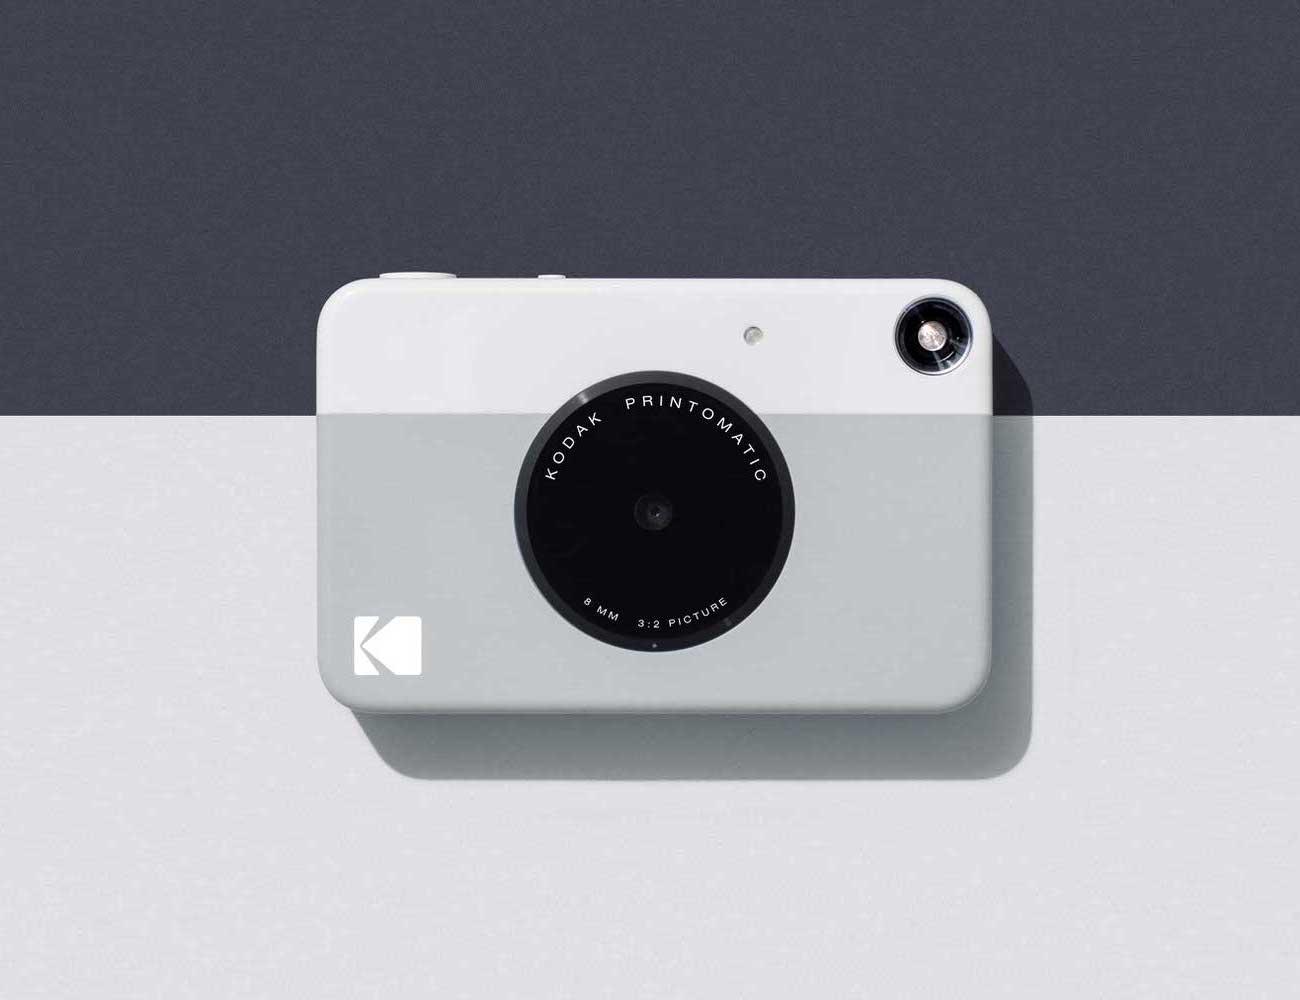 Kodak+PRINTOMATIC+Instant+Print+Camera